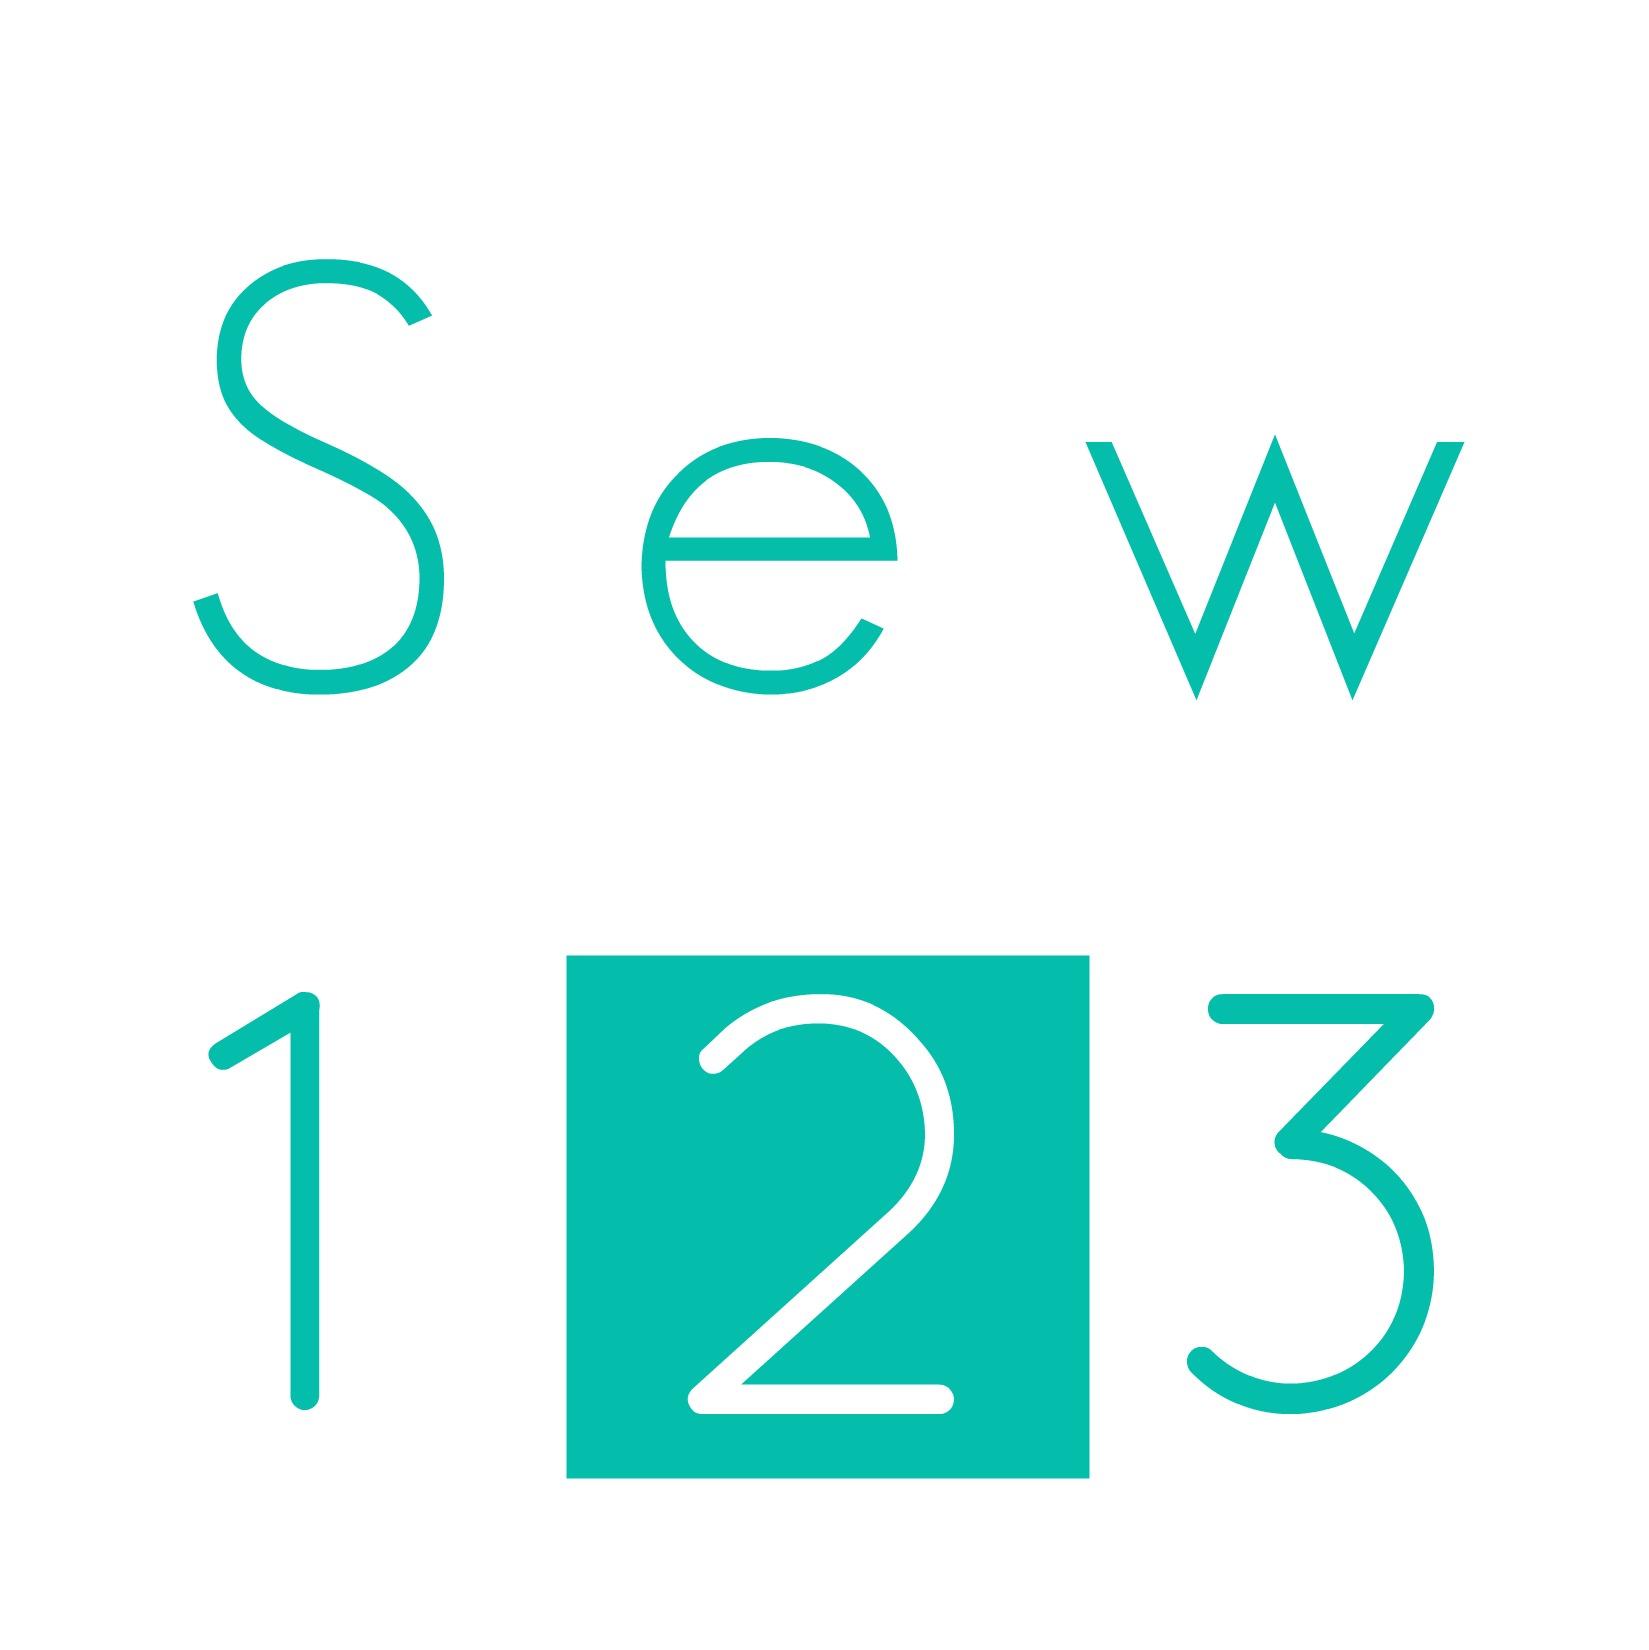 Sew 2 Intermediate | Sew You Studio.com